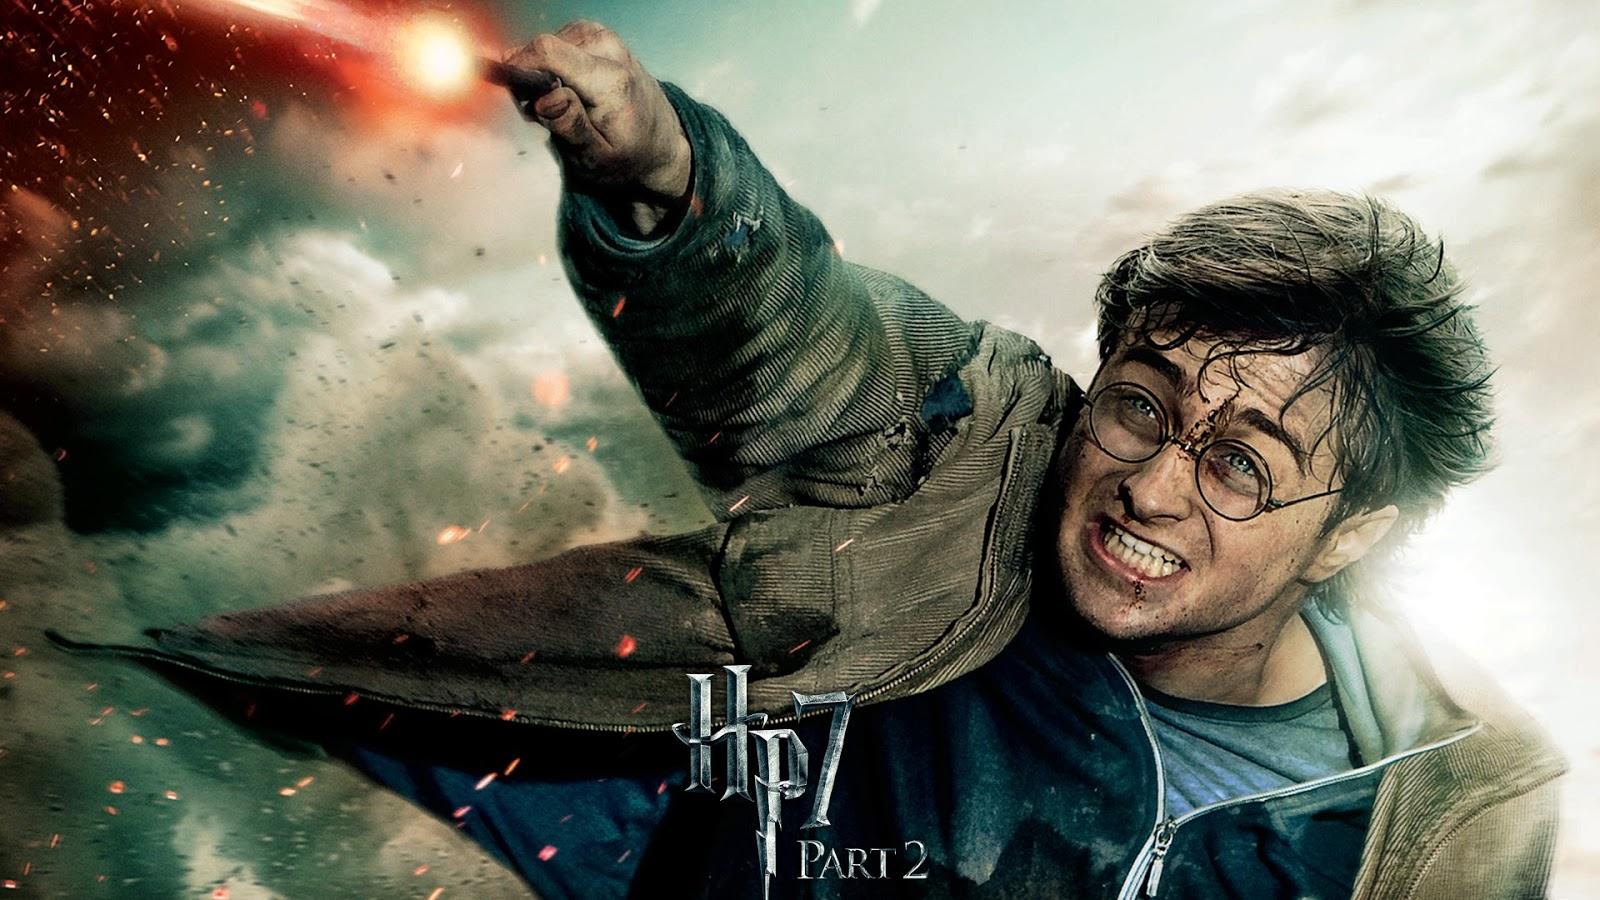 Harry Potter Daniel Radcliff